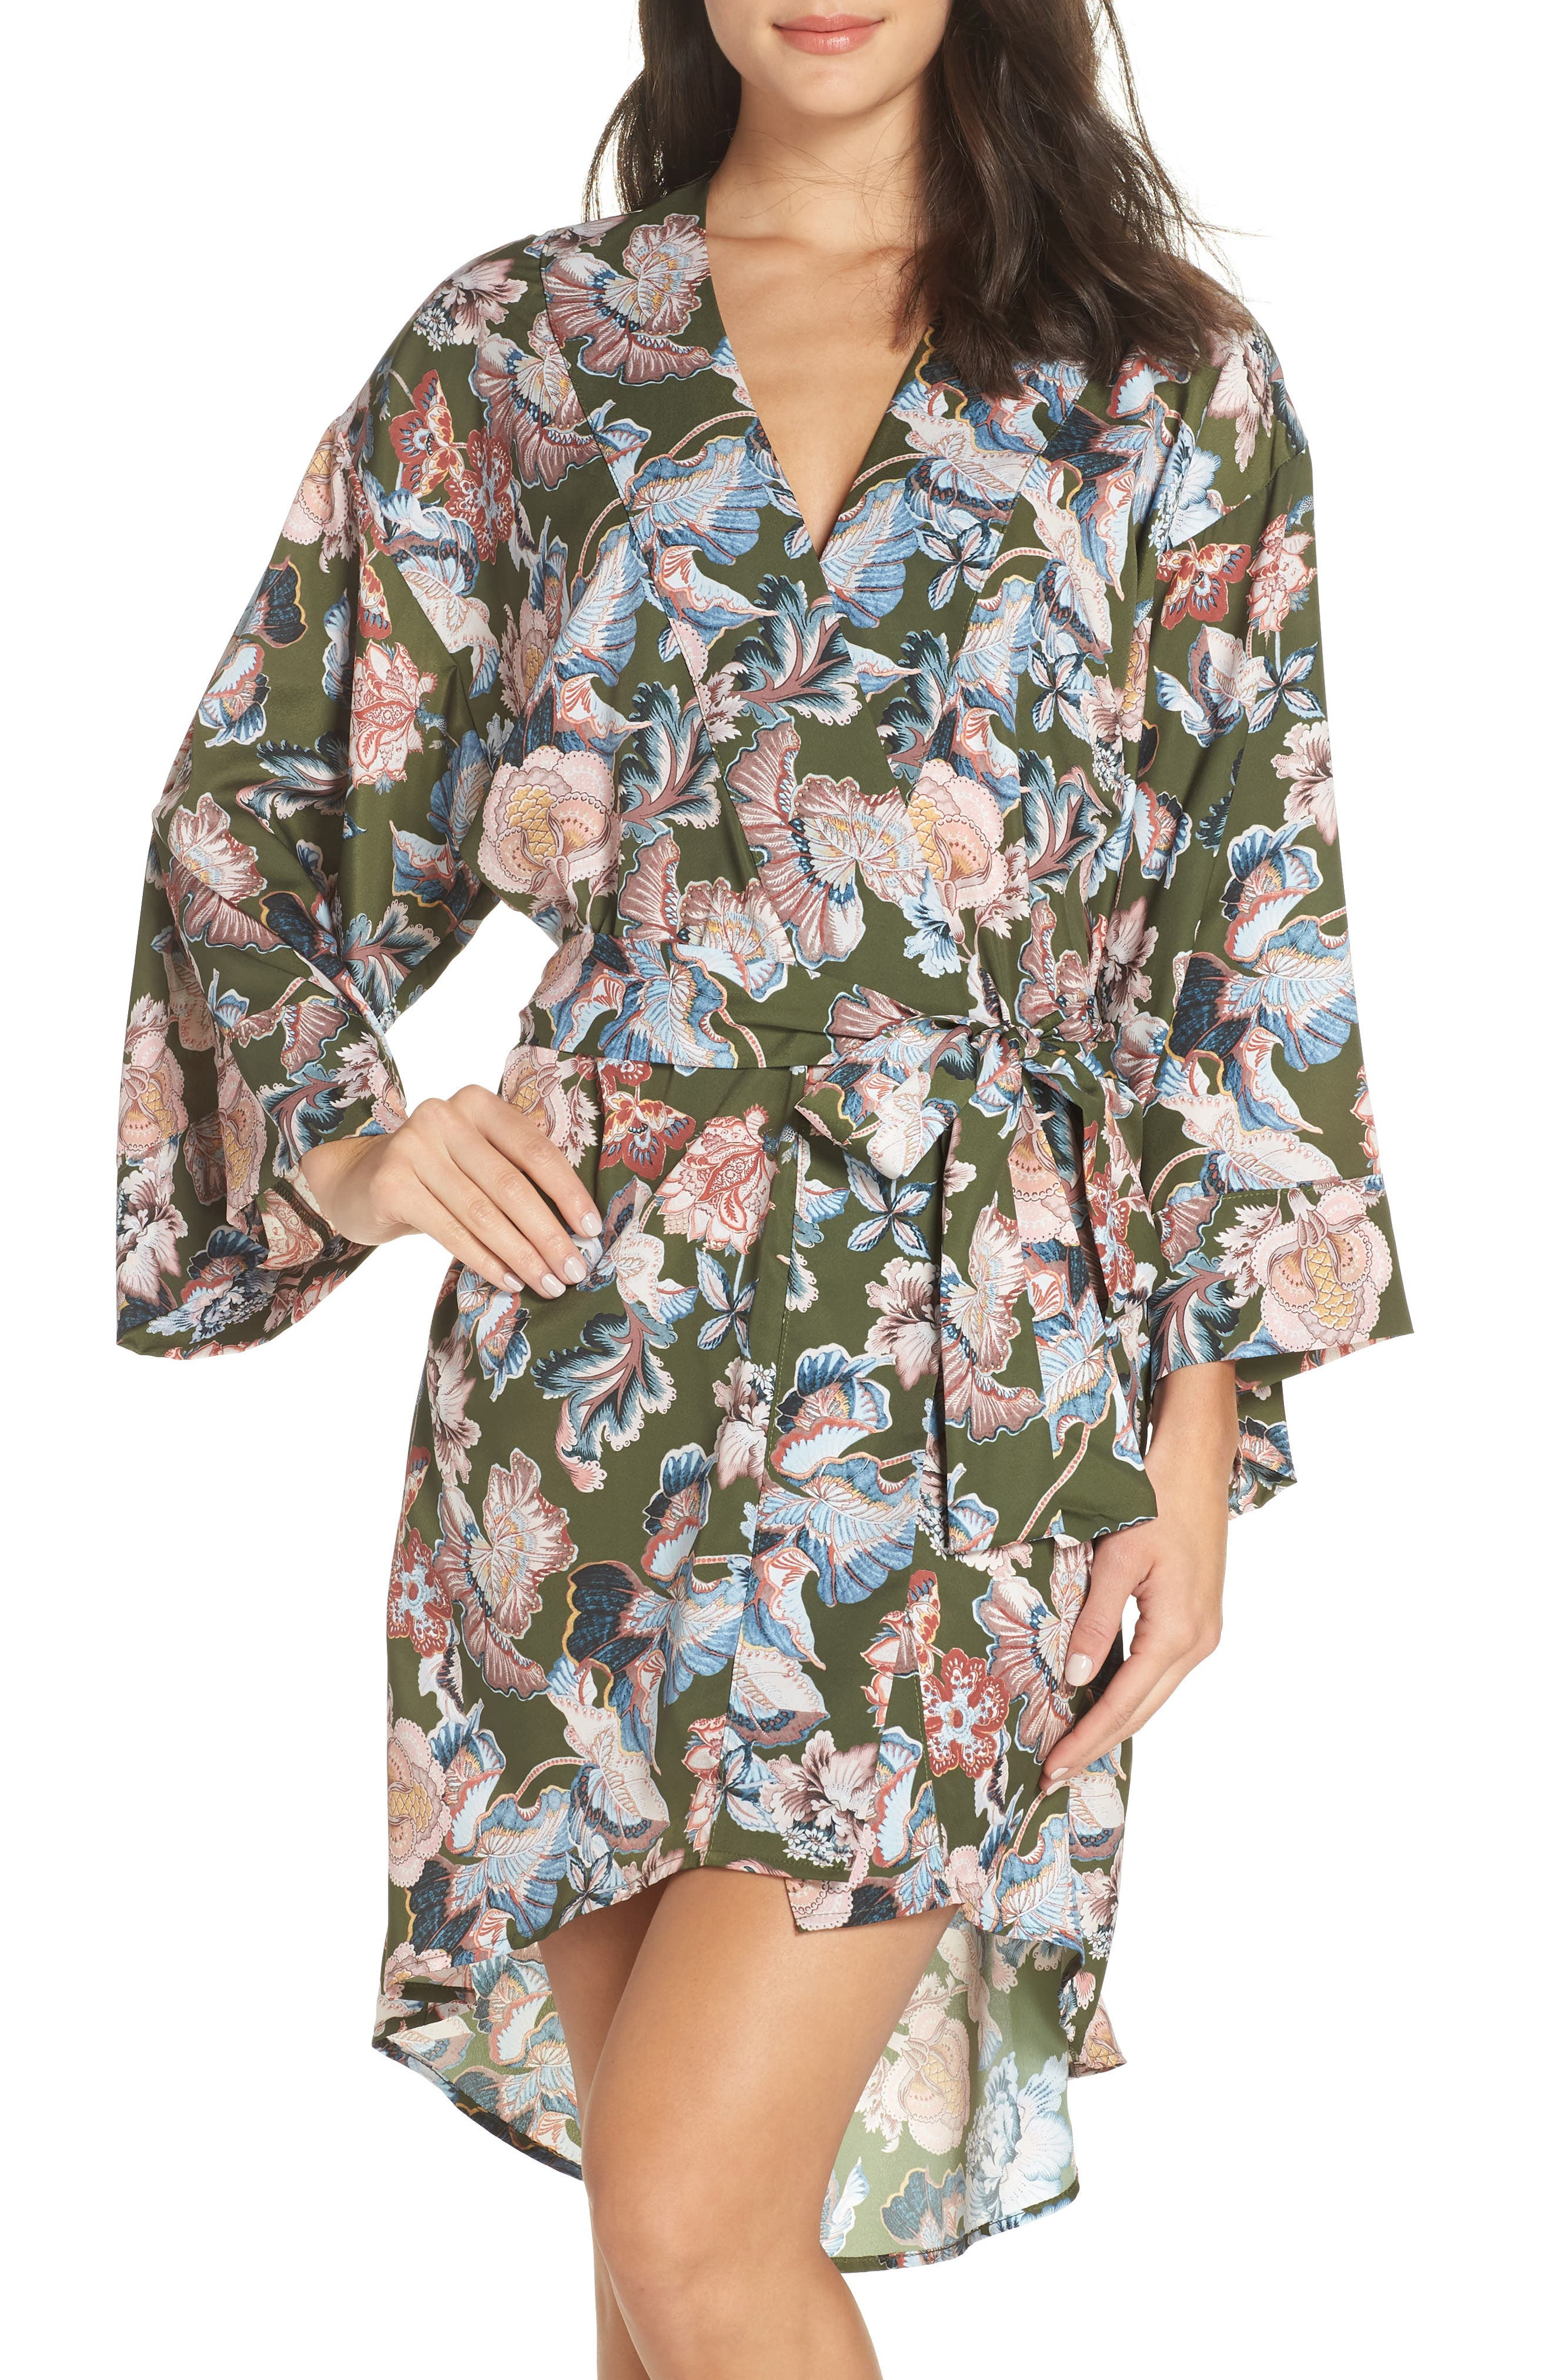 MAISON DU SOIR Leila Short Robe in Olive Floral